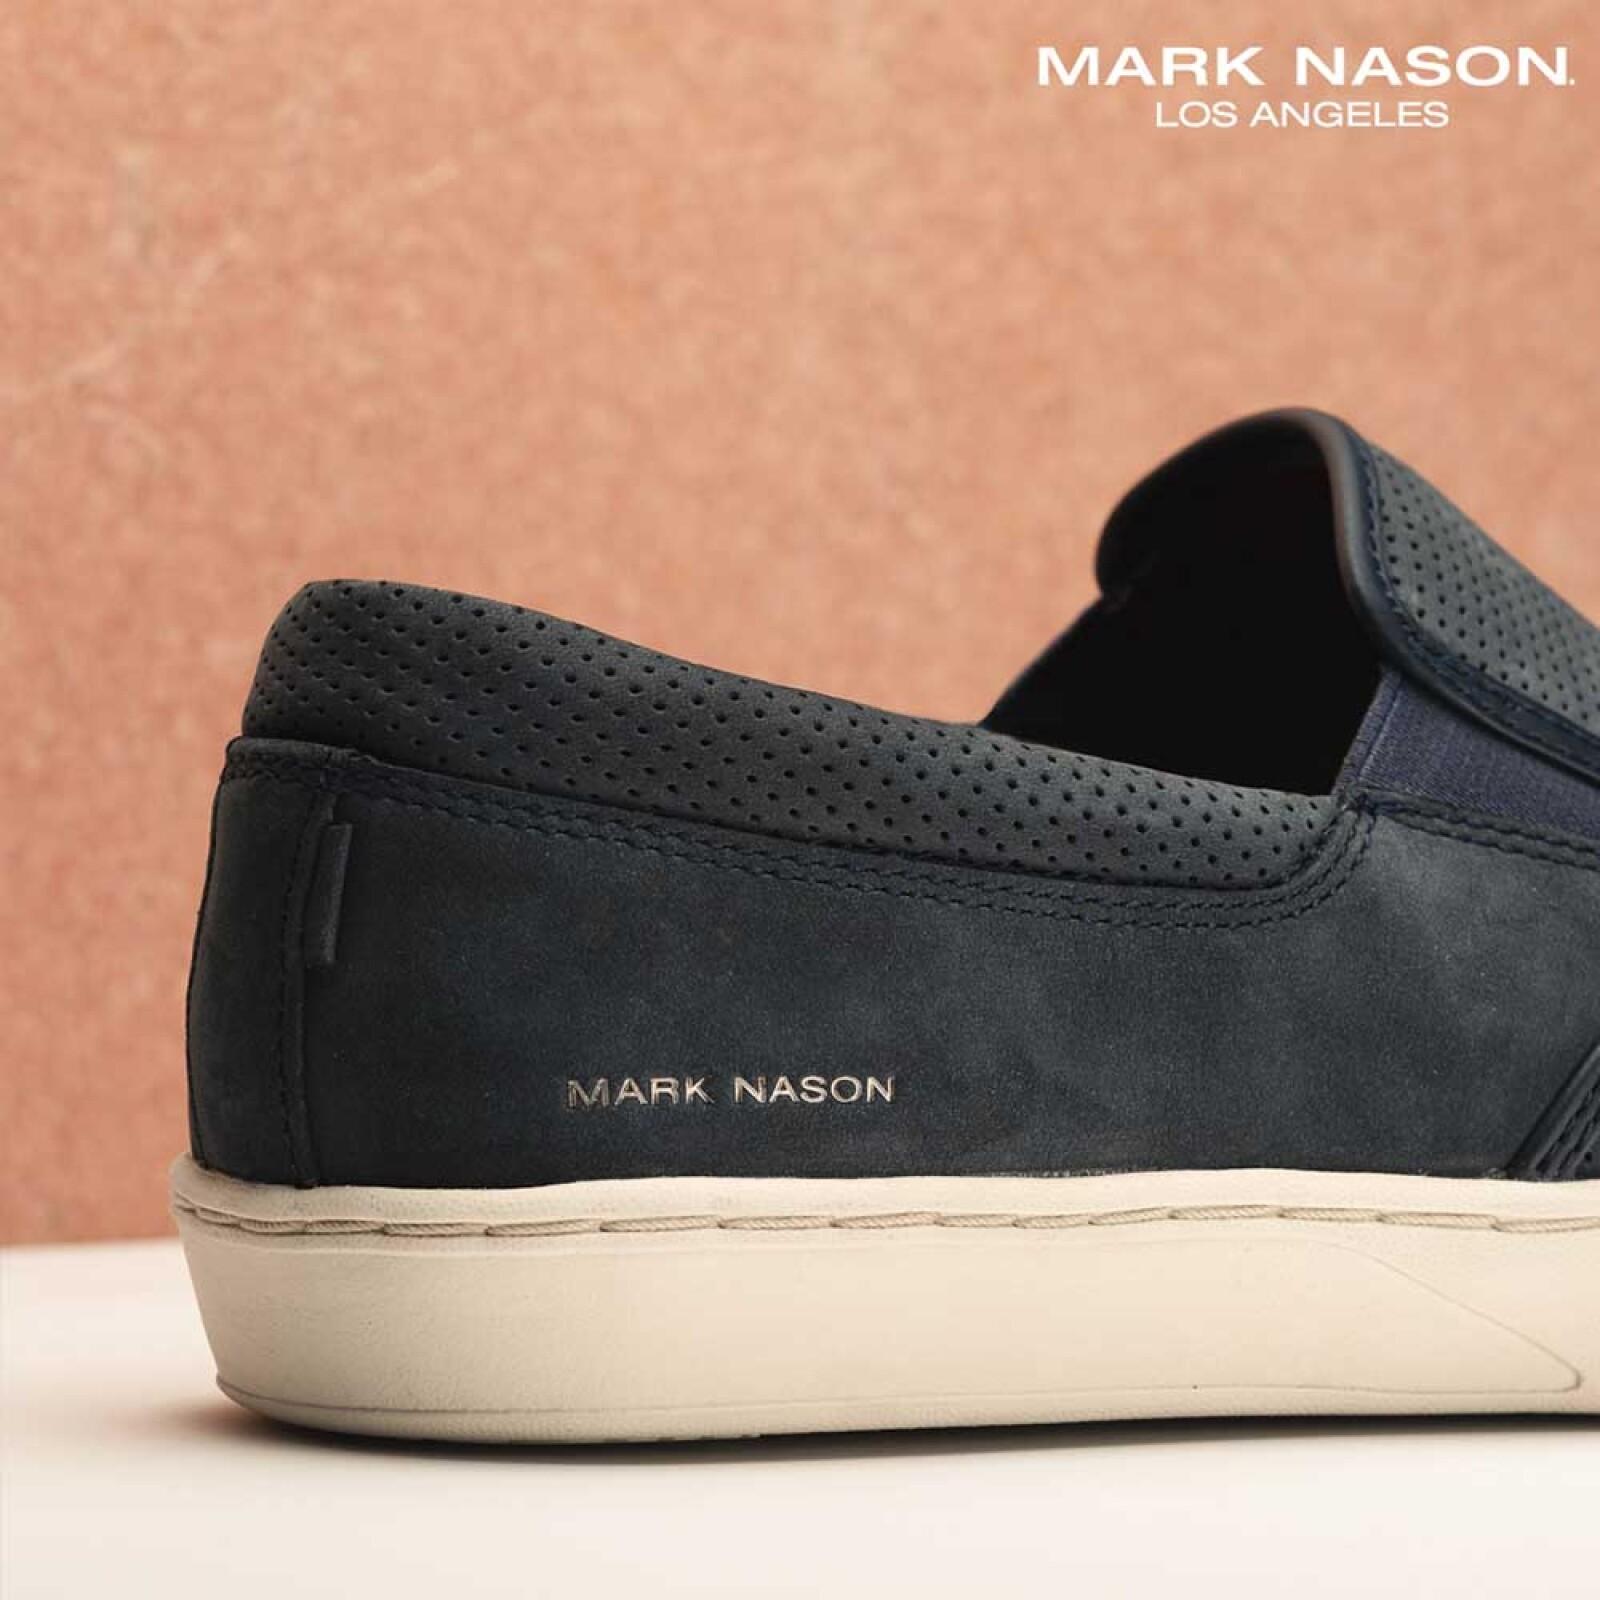 Mark Nason_1.jpg